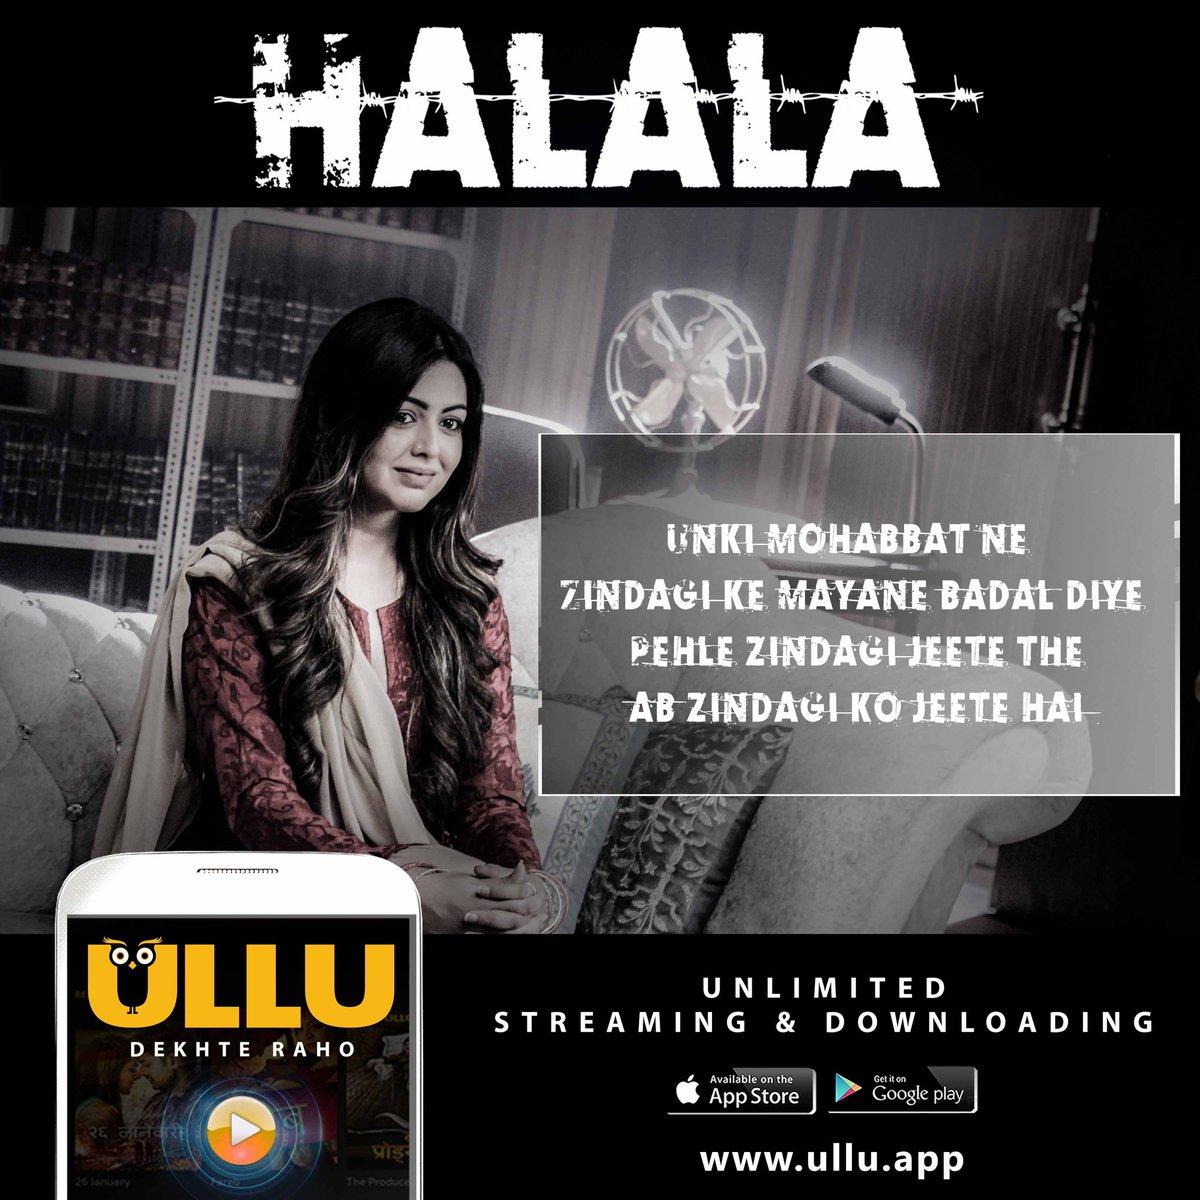 Afza ke Zindagi ke utaar chadhaav streaming now Halala Season 1 only